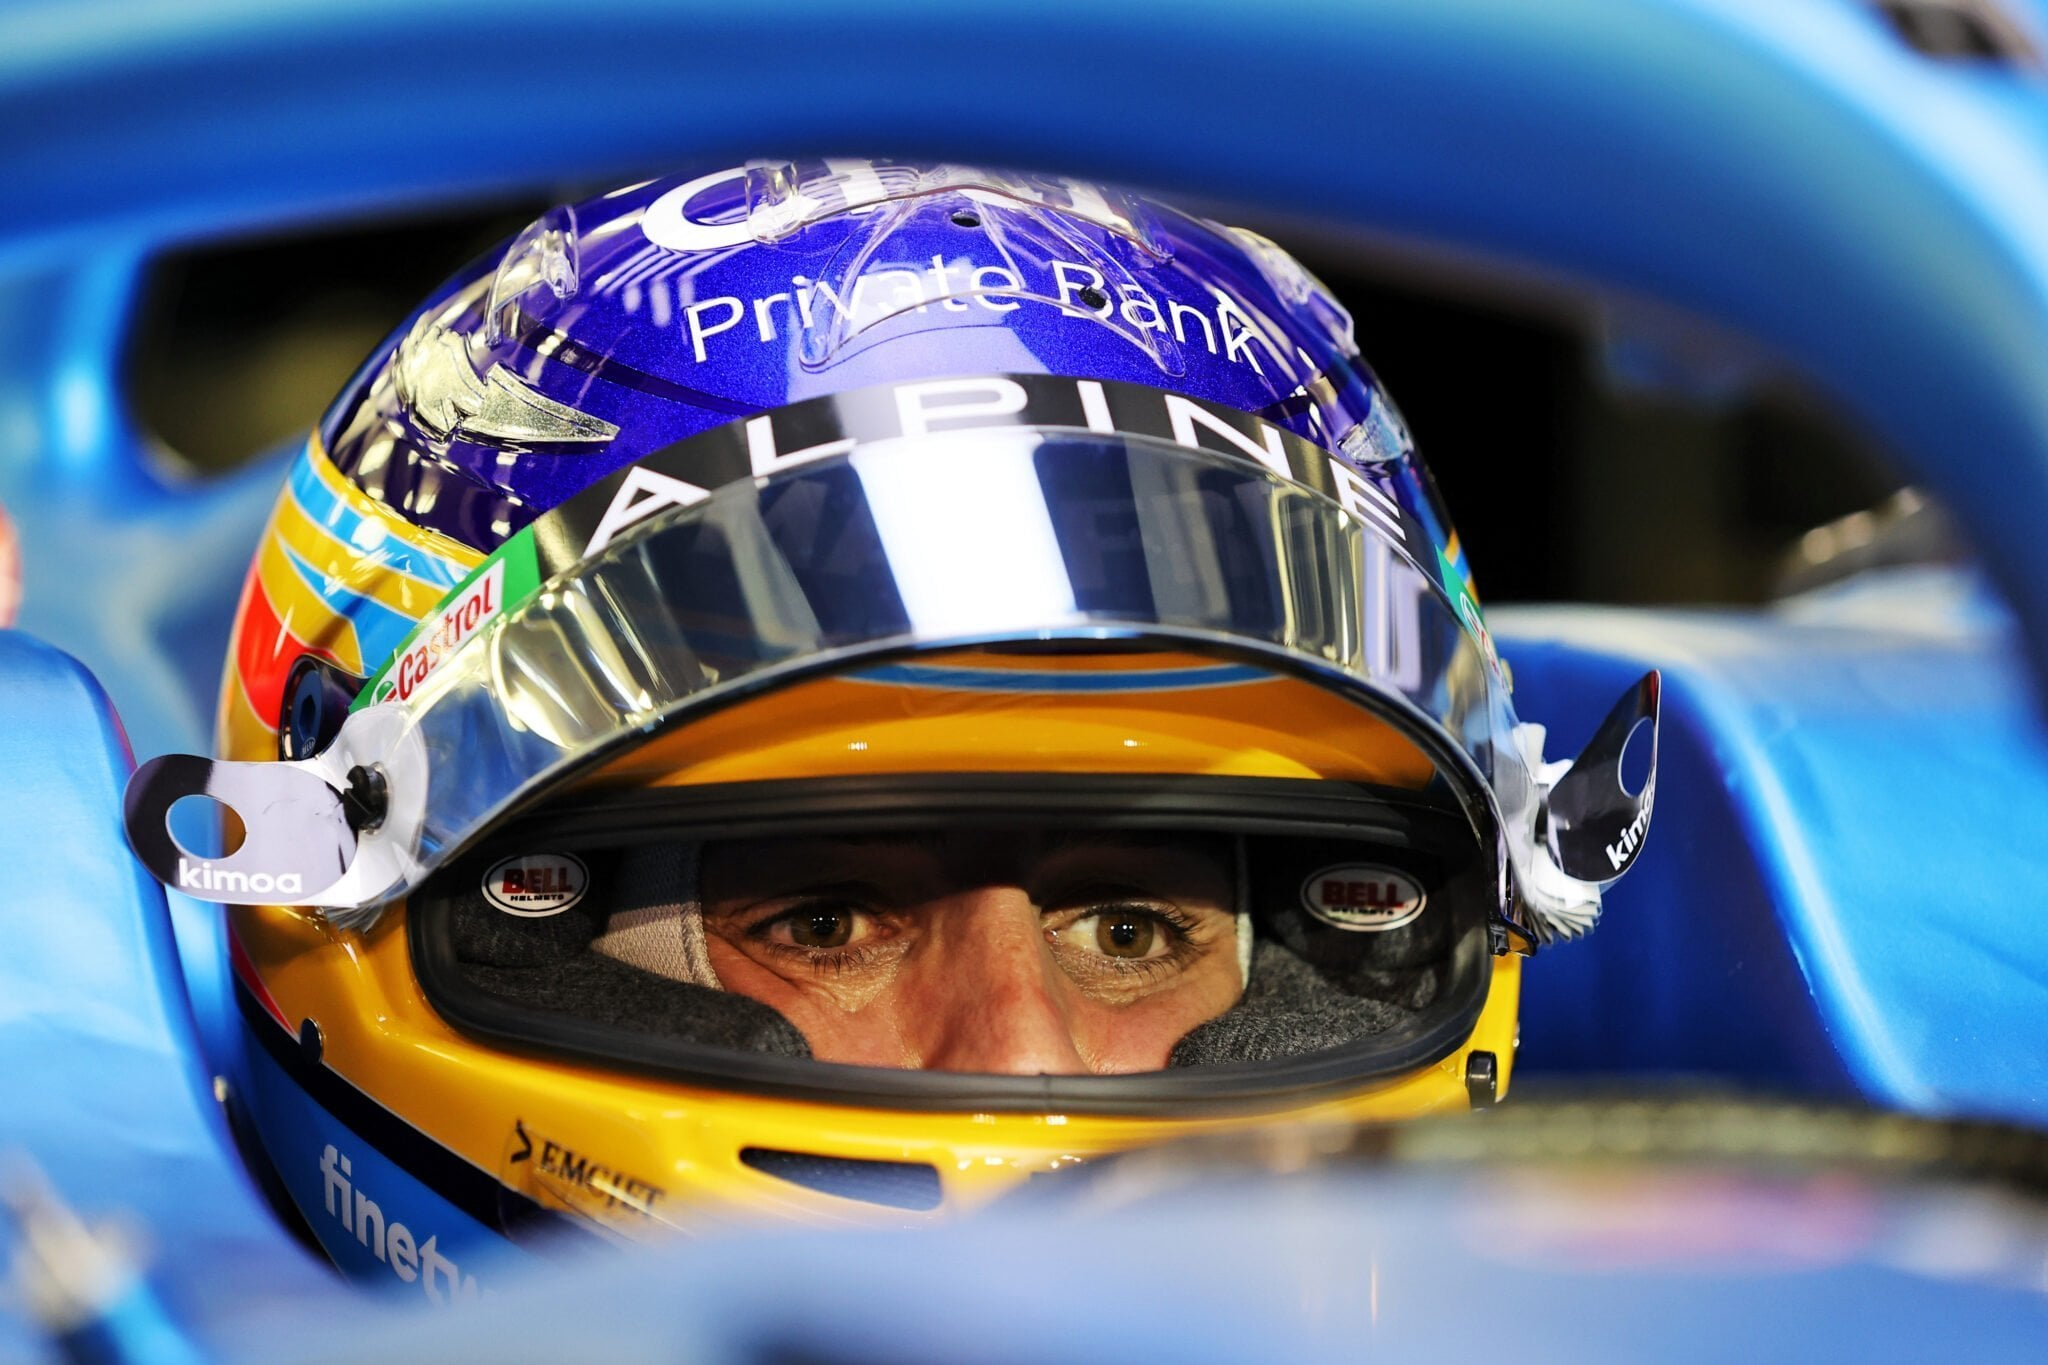 Fernando Alonso Fernando Alonso Alpine F1 Team Bahrain Sakhir 2021 | Alpine F1 Team : Alonso et Ocon débutent les essais à Bahreïn